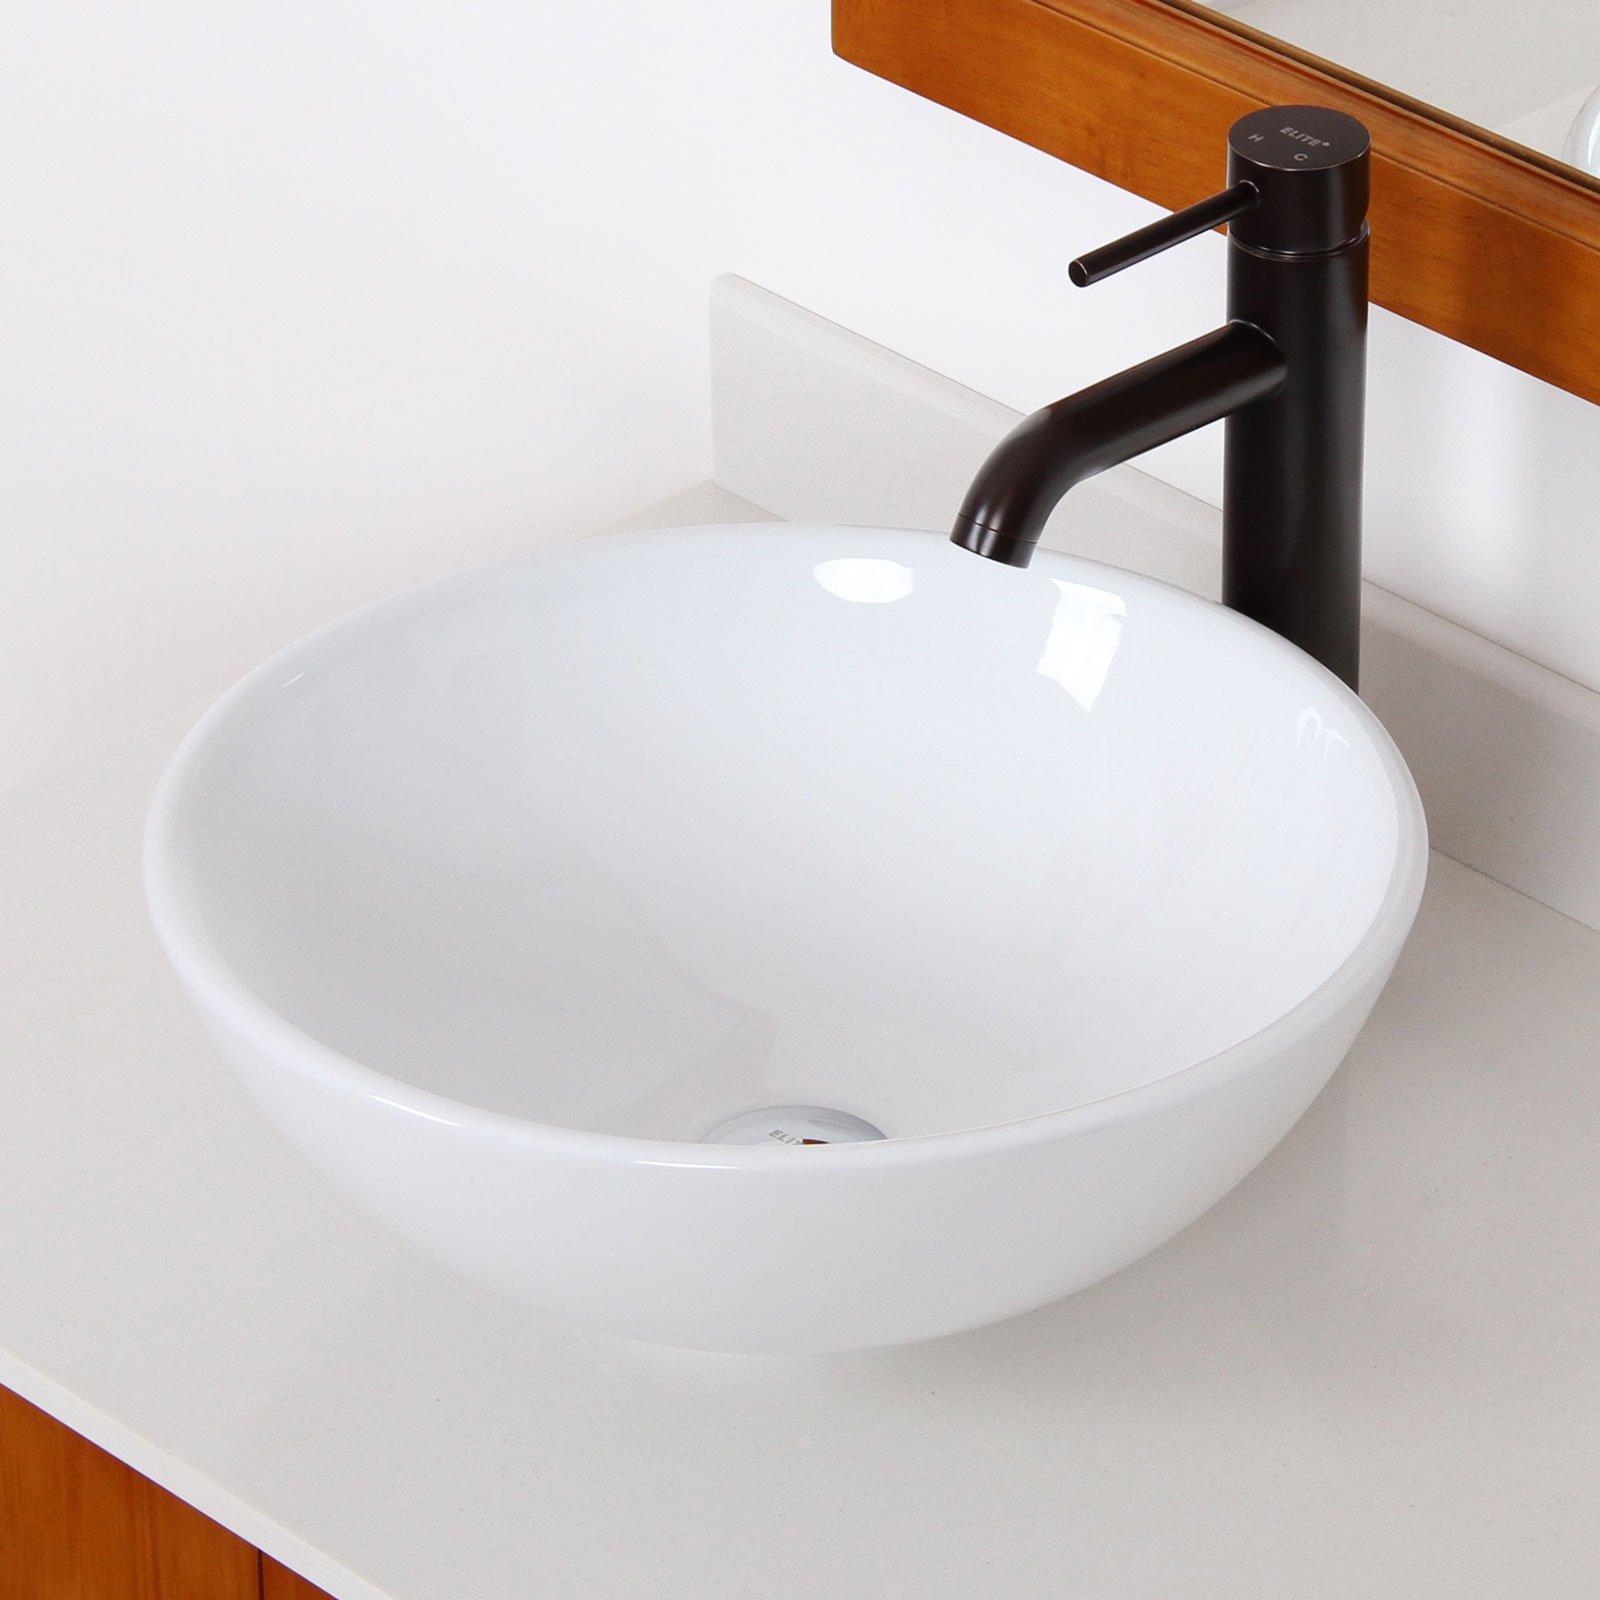 ELITE Bathroom Round White Ceramic Porcelain Vessel Sink & Oil Rubbed Bronze Faucet Combo by ELITE